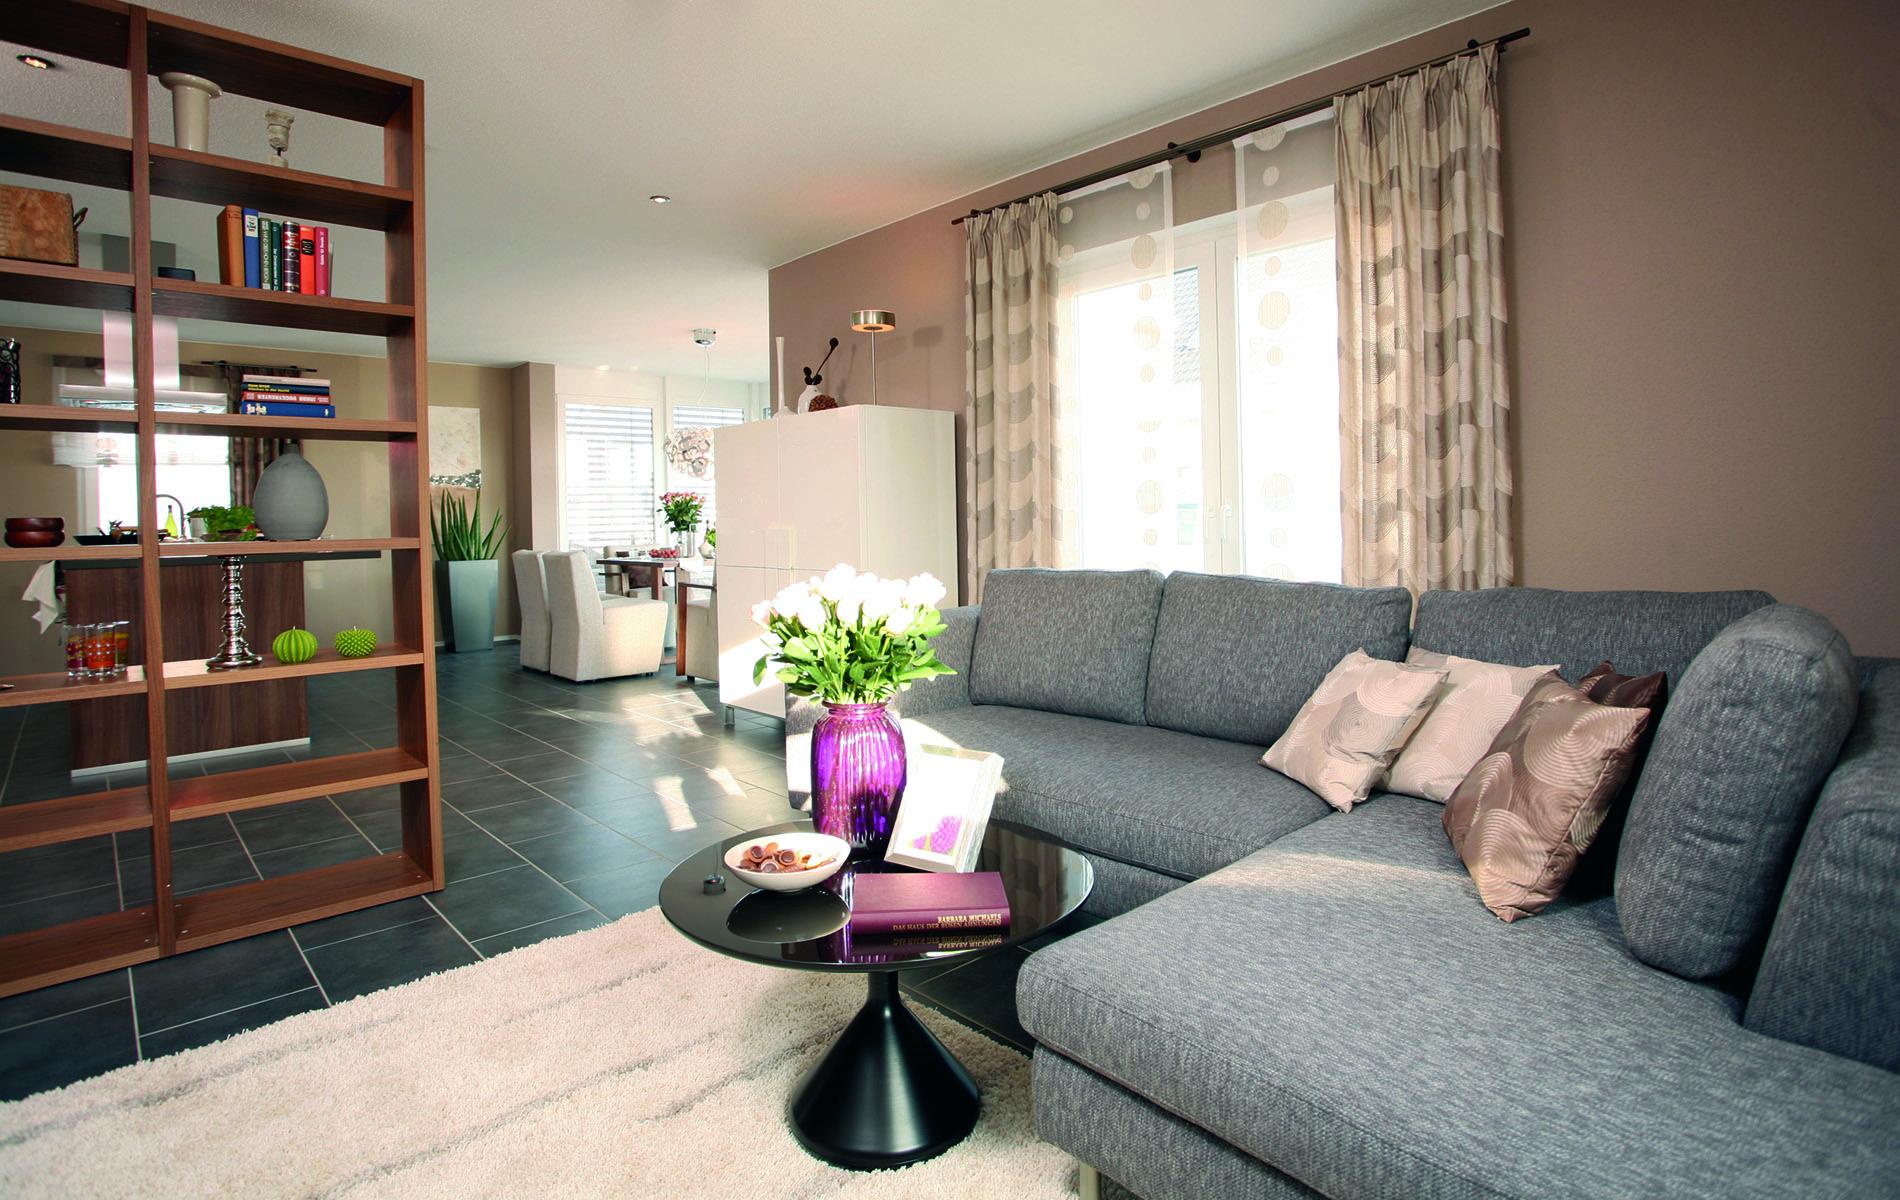 MEDLEY 3.0 - Nürnberg - heller geräumiger Wohnbereich